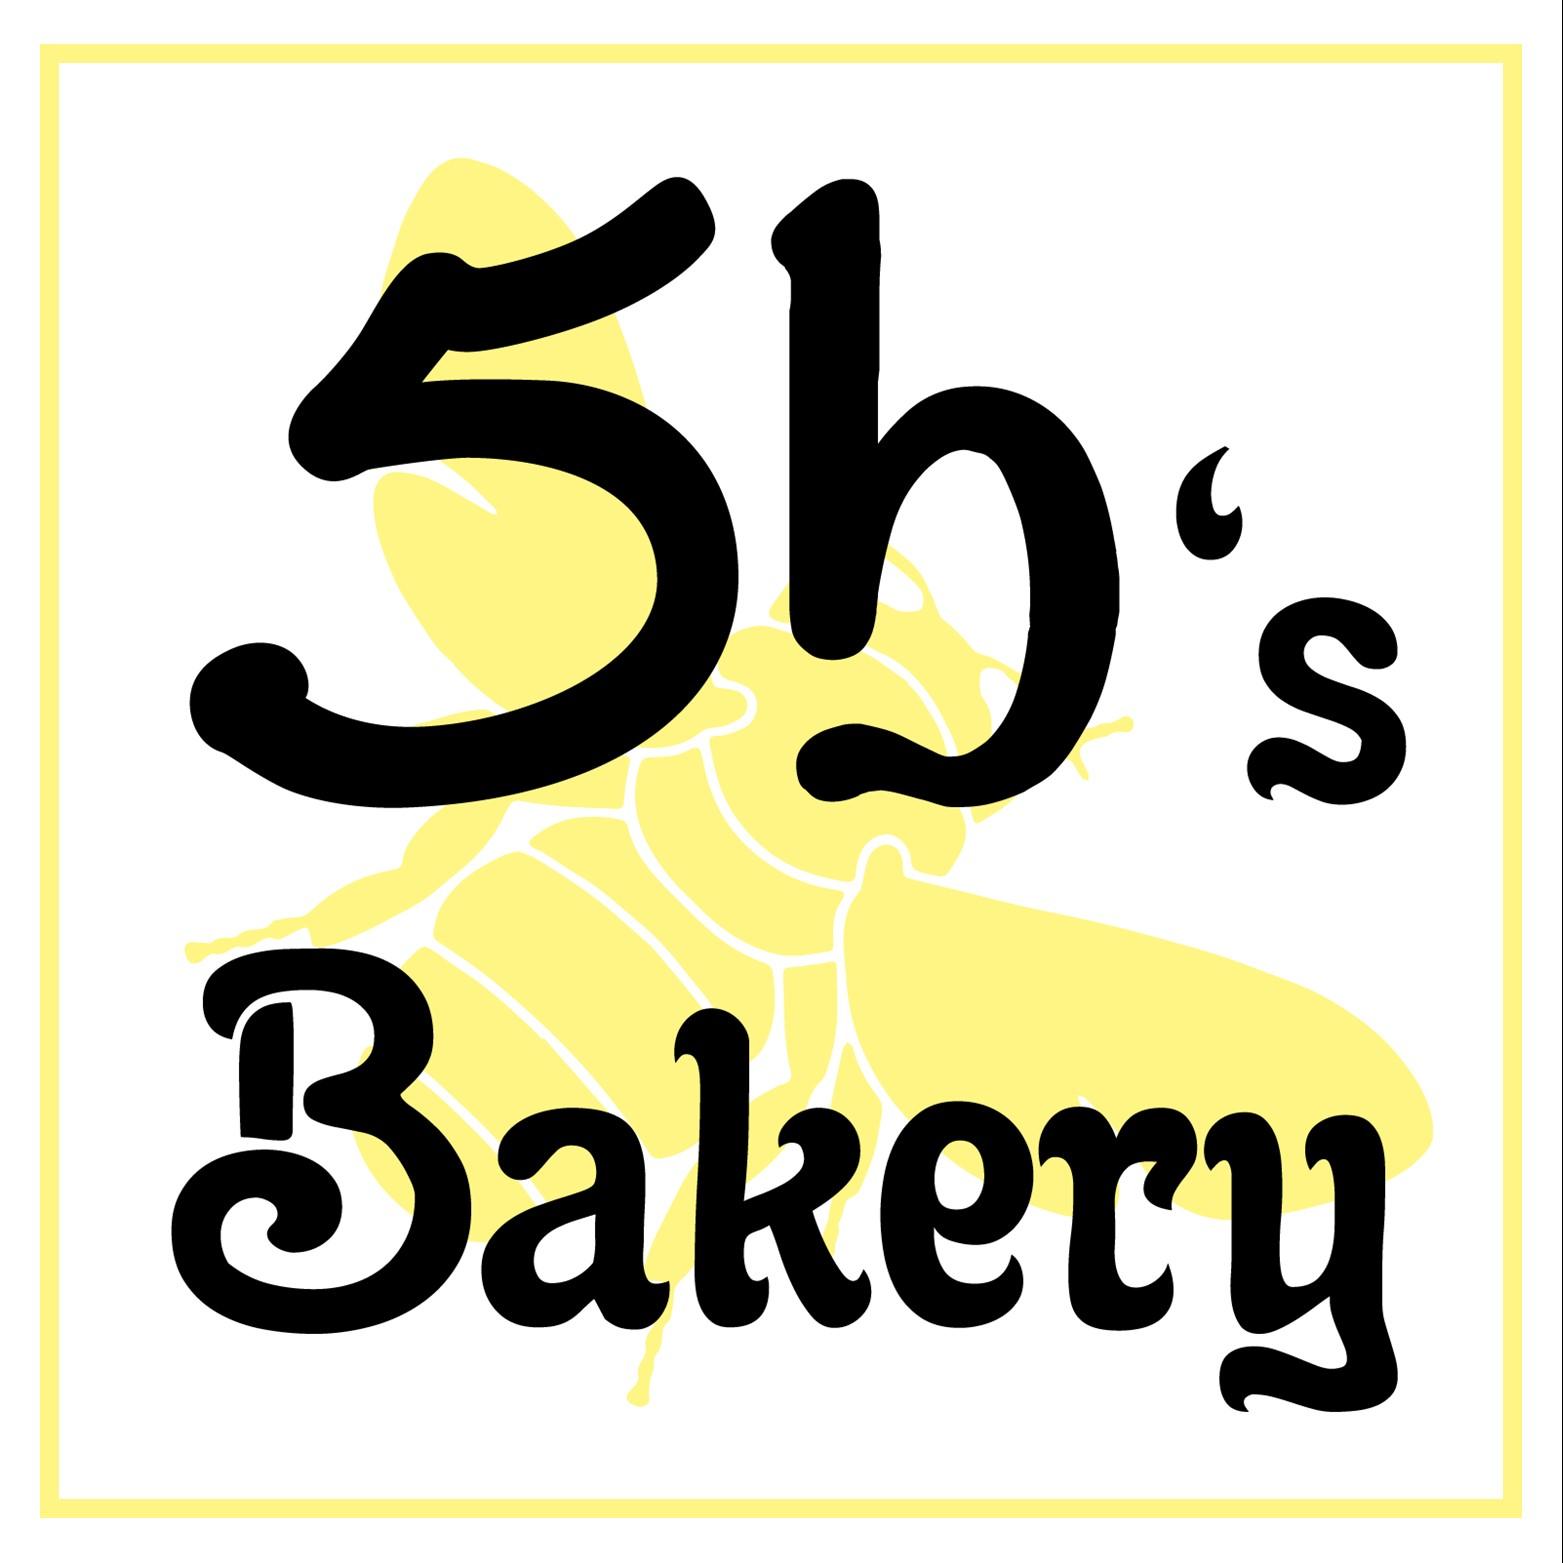 5 B's Bakery